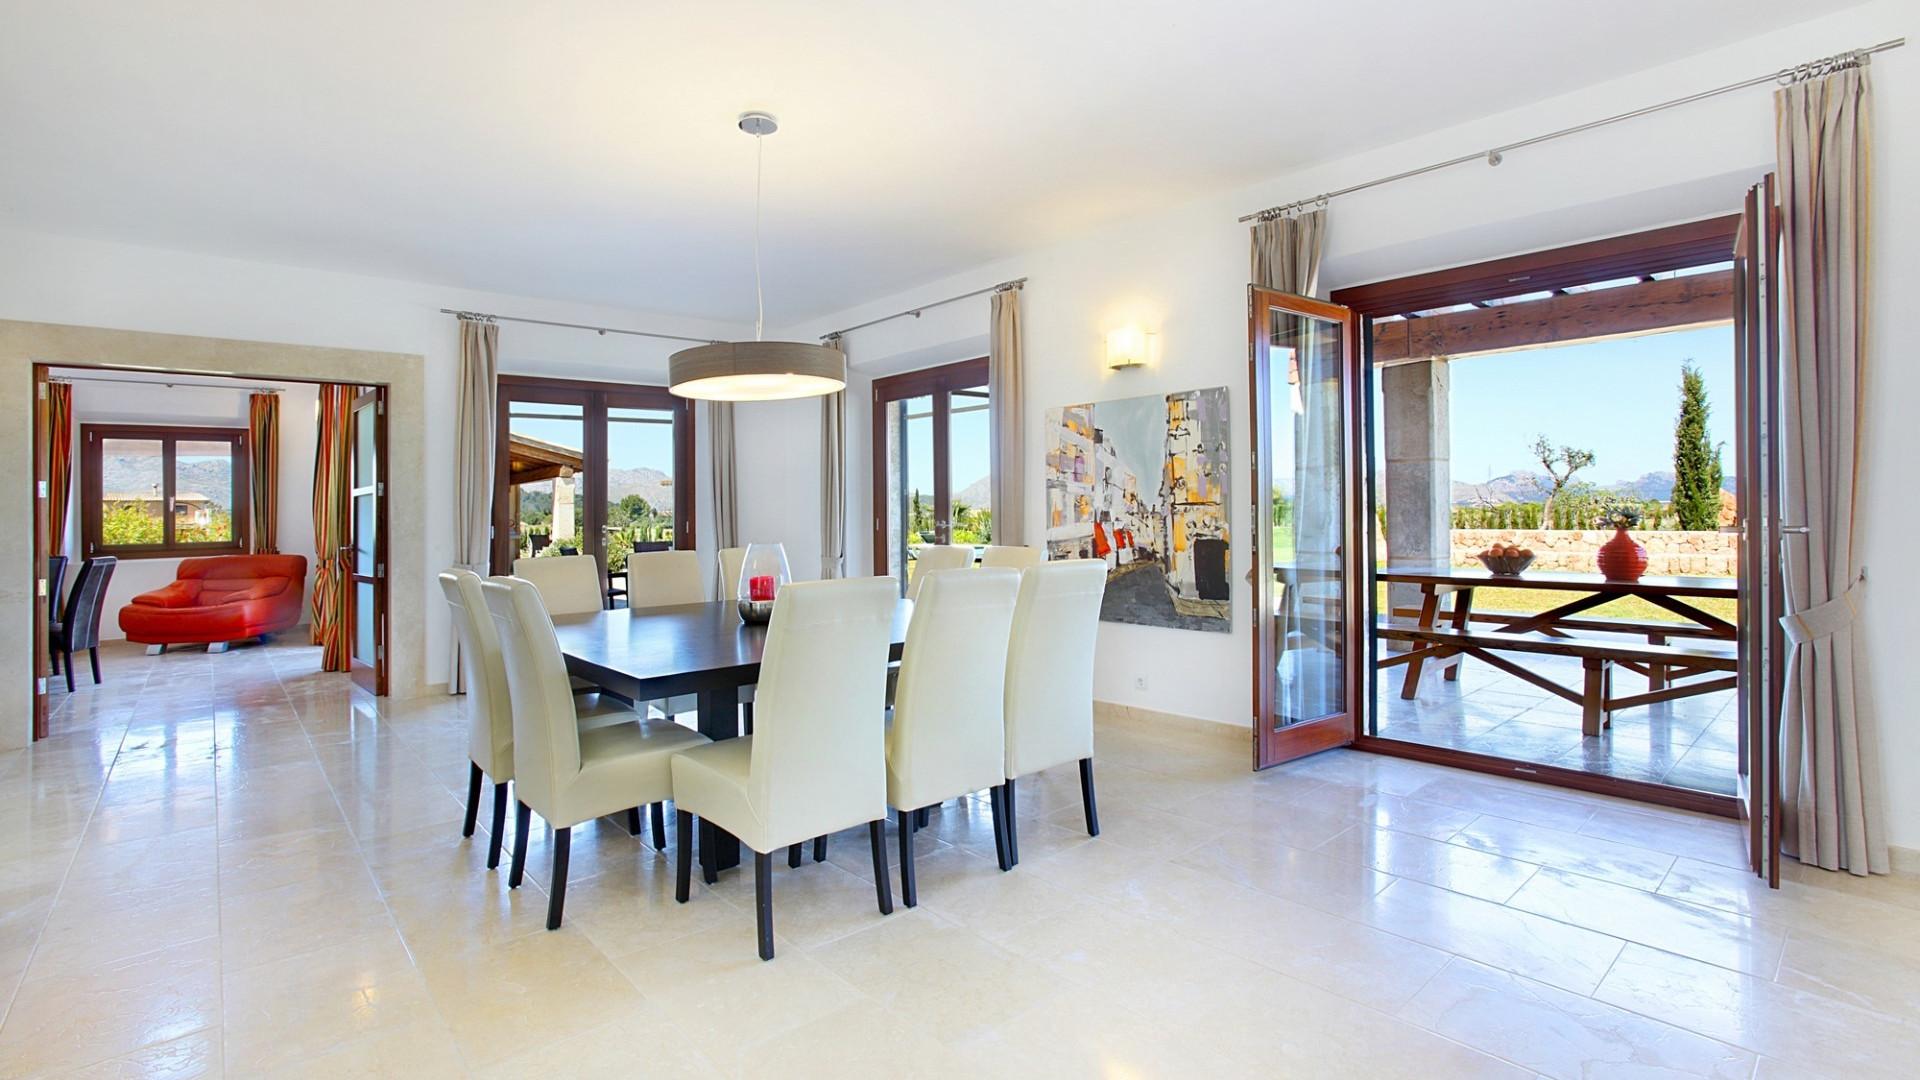 Luxury 5 Bedroom Villa Pollenca Large Private Pool & Table Tennis